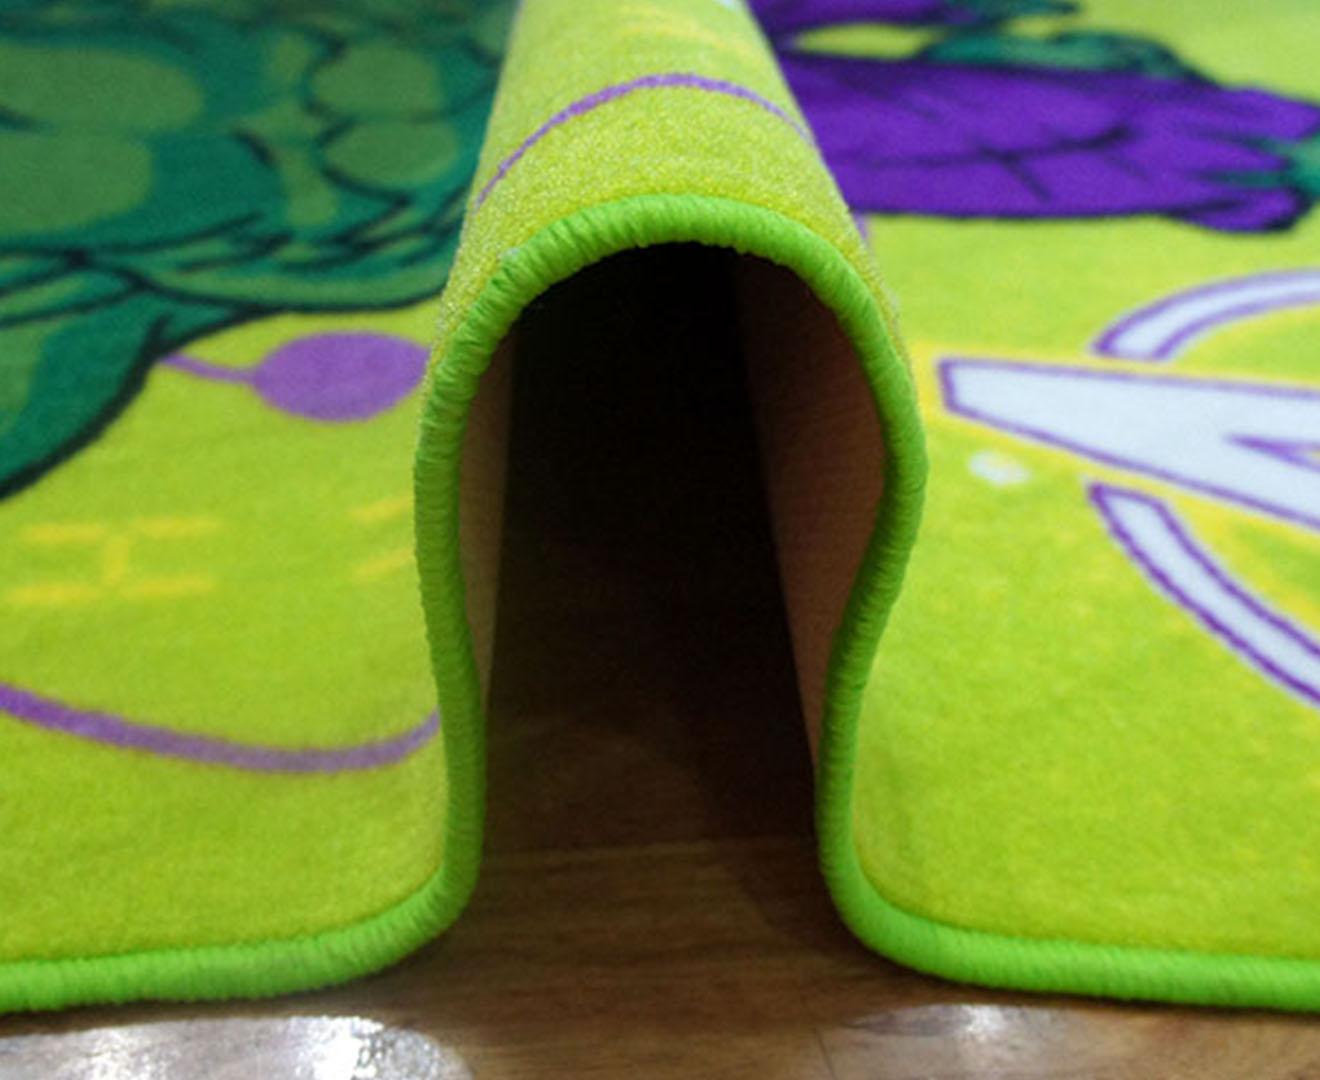 Catch.com.au | The Incredible Hulk 150cm x 100cm Kids' Printed Rug ...